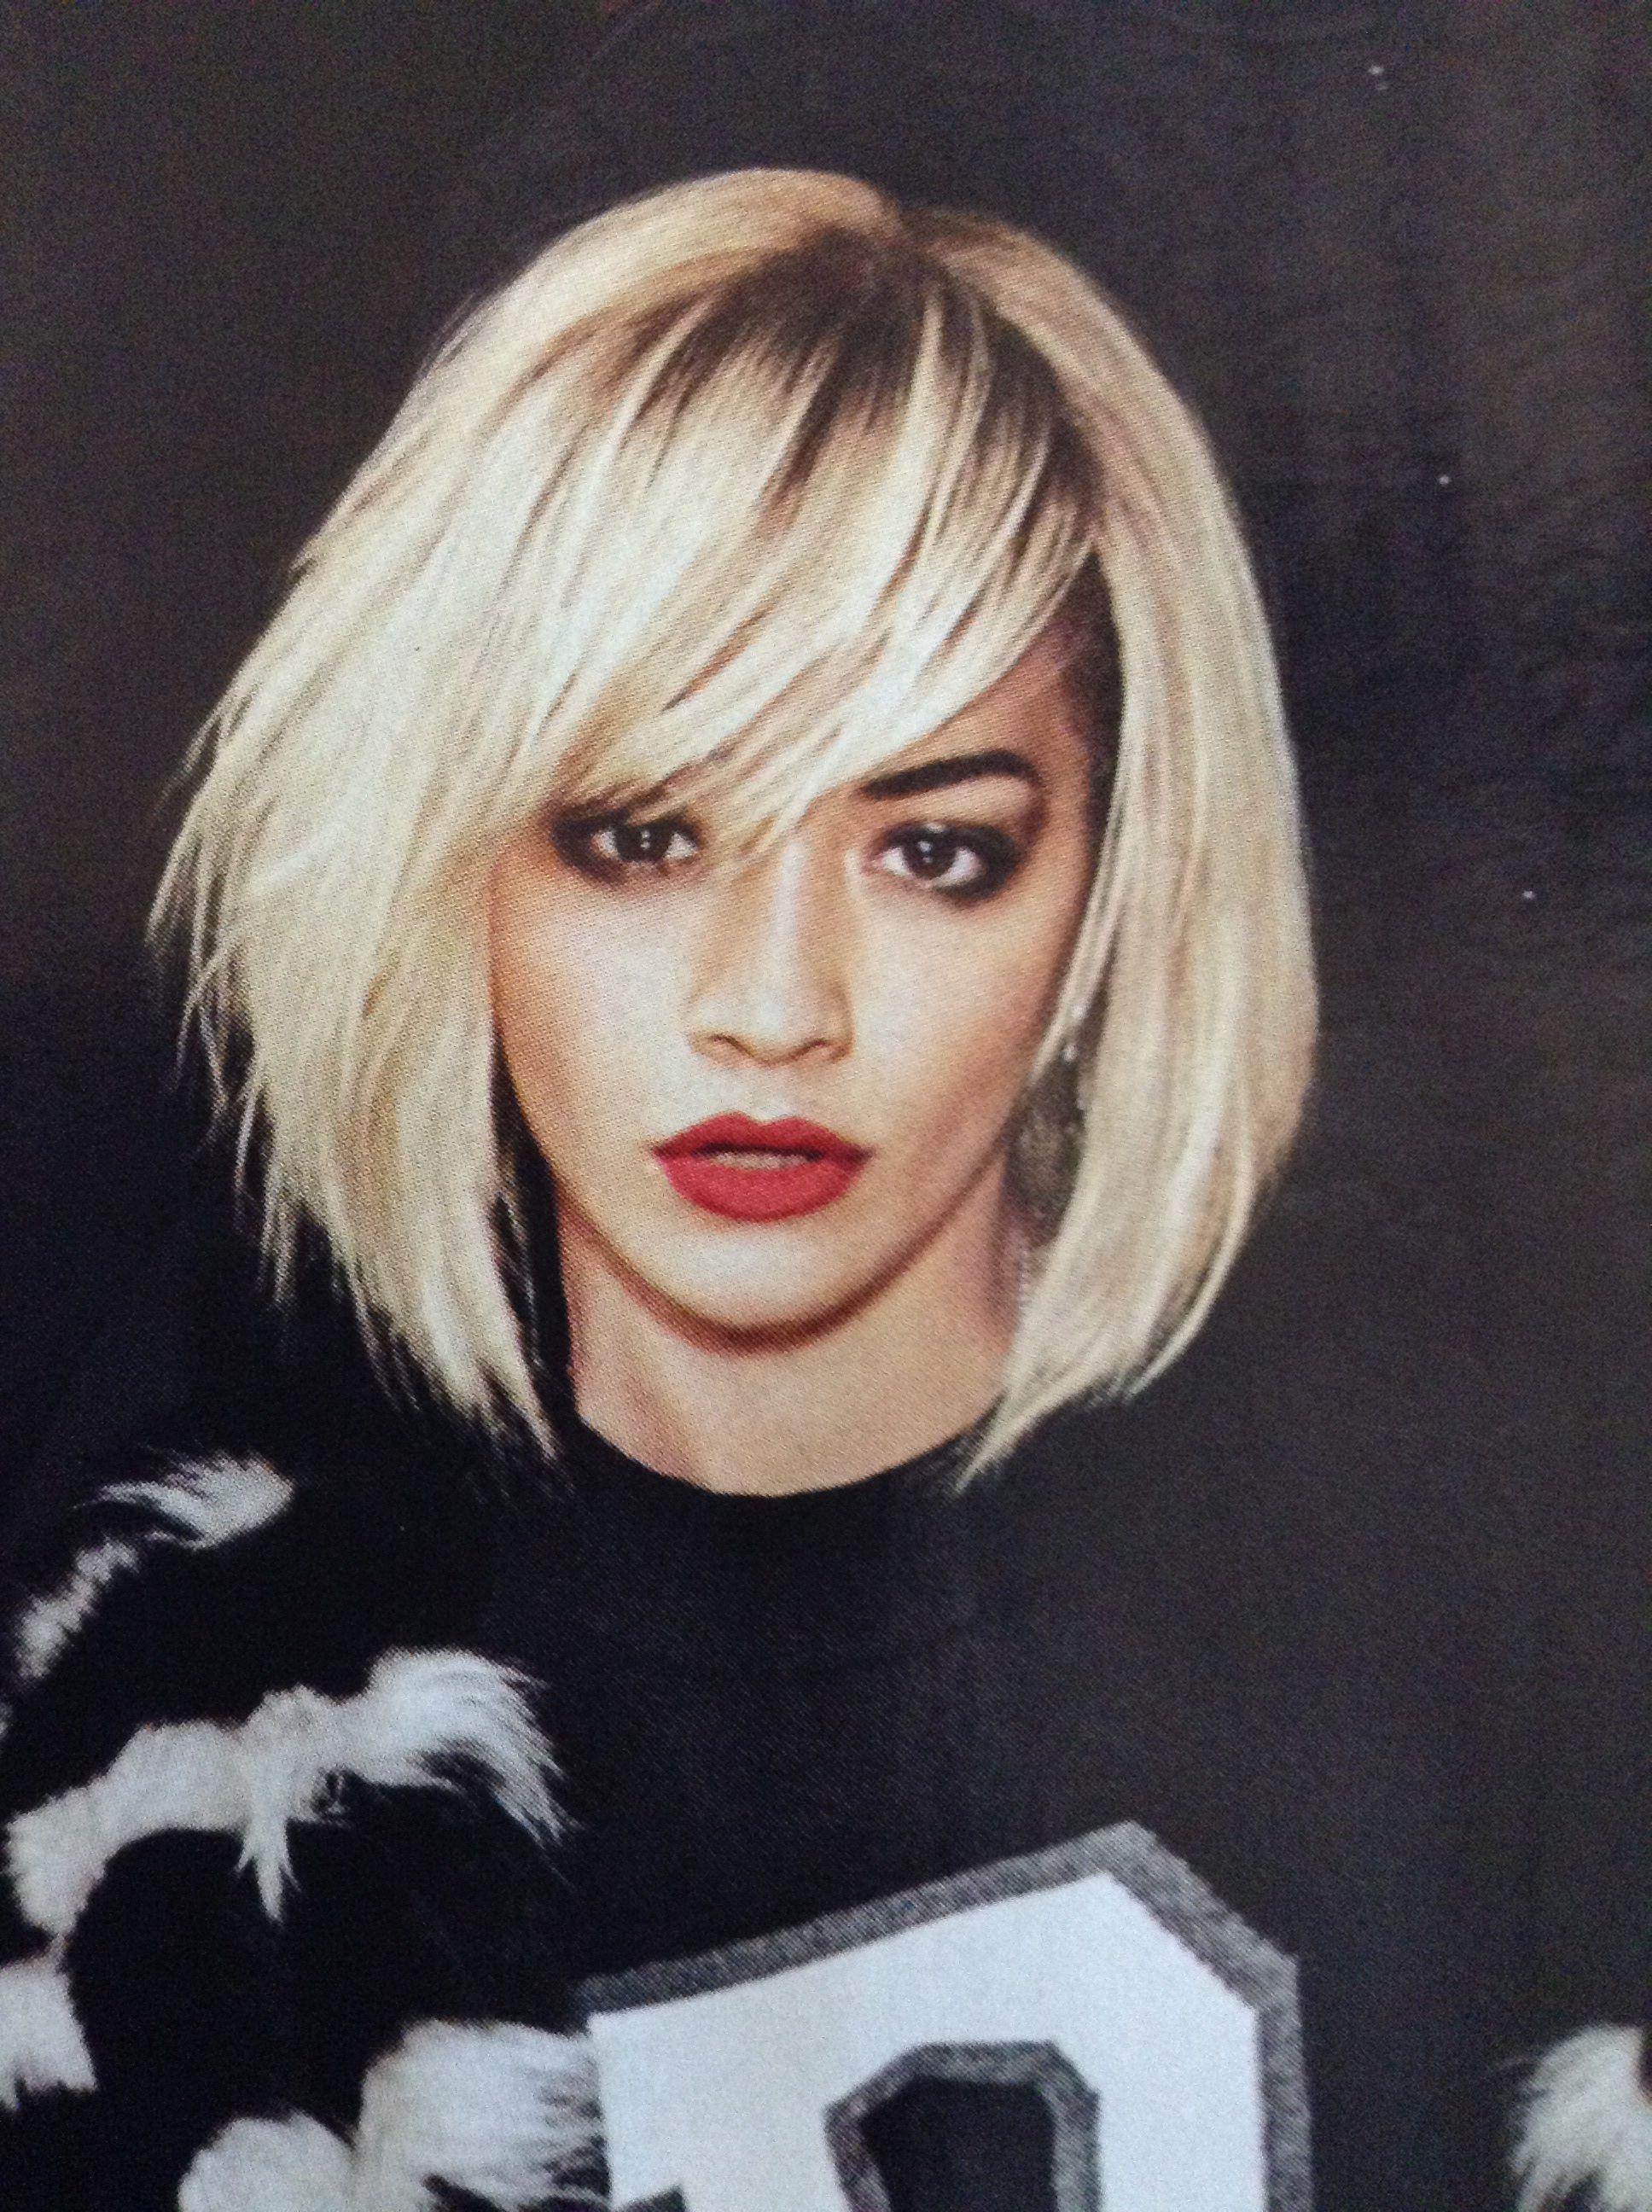 Rita Ora Hair And Makeup Perfection Short Hair Styles Medium Hair Styles Hair Styles